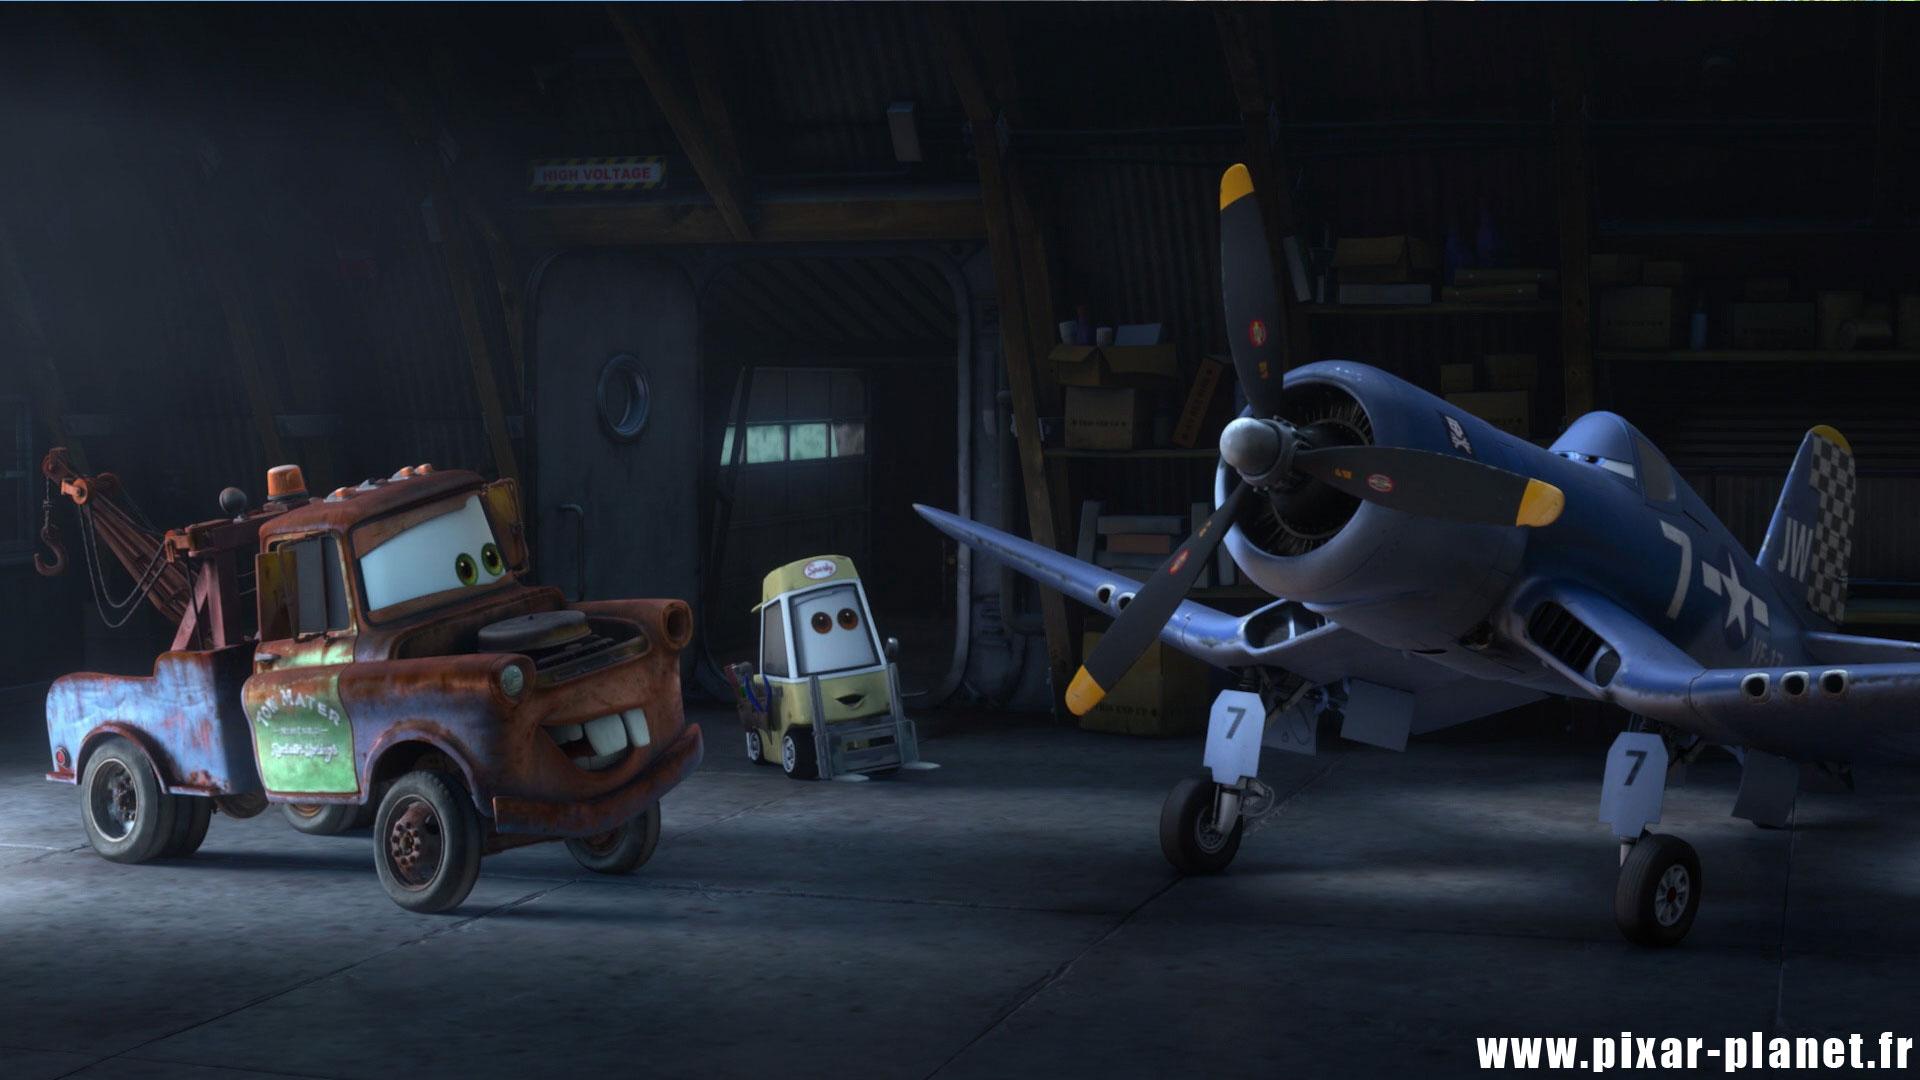 Pixar Planet Disney Clin Oeil Easter Egg cars toon